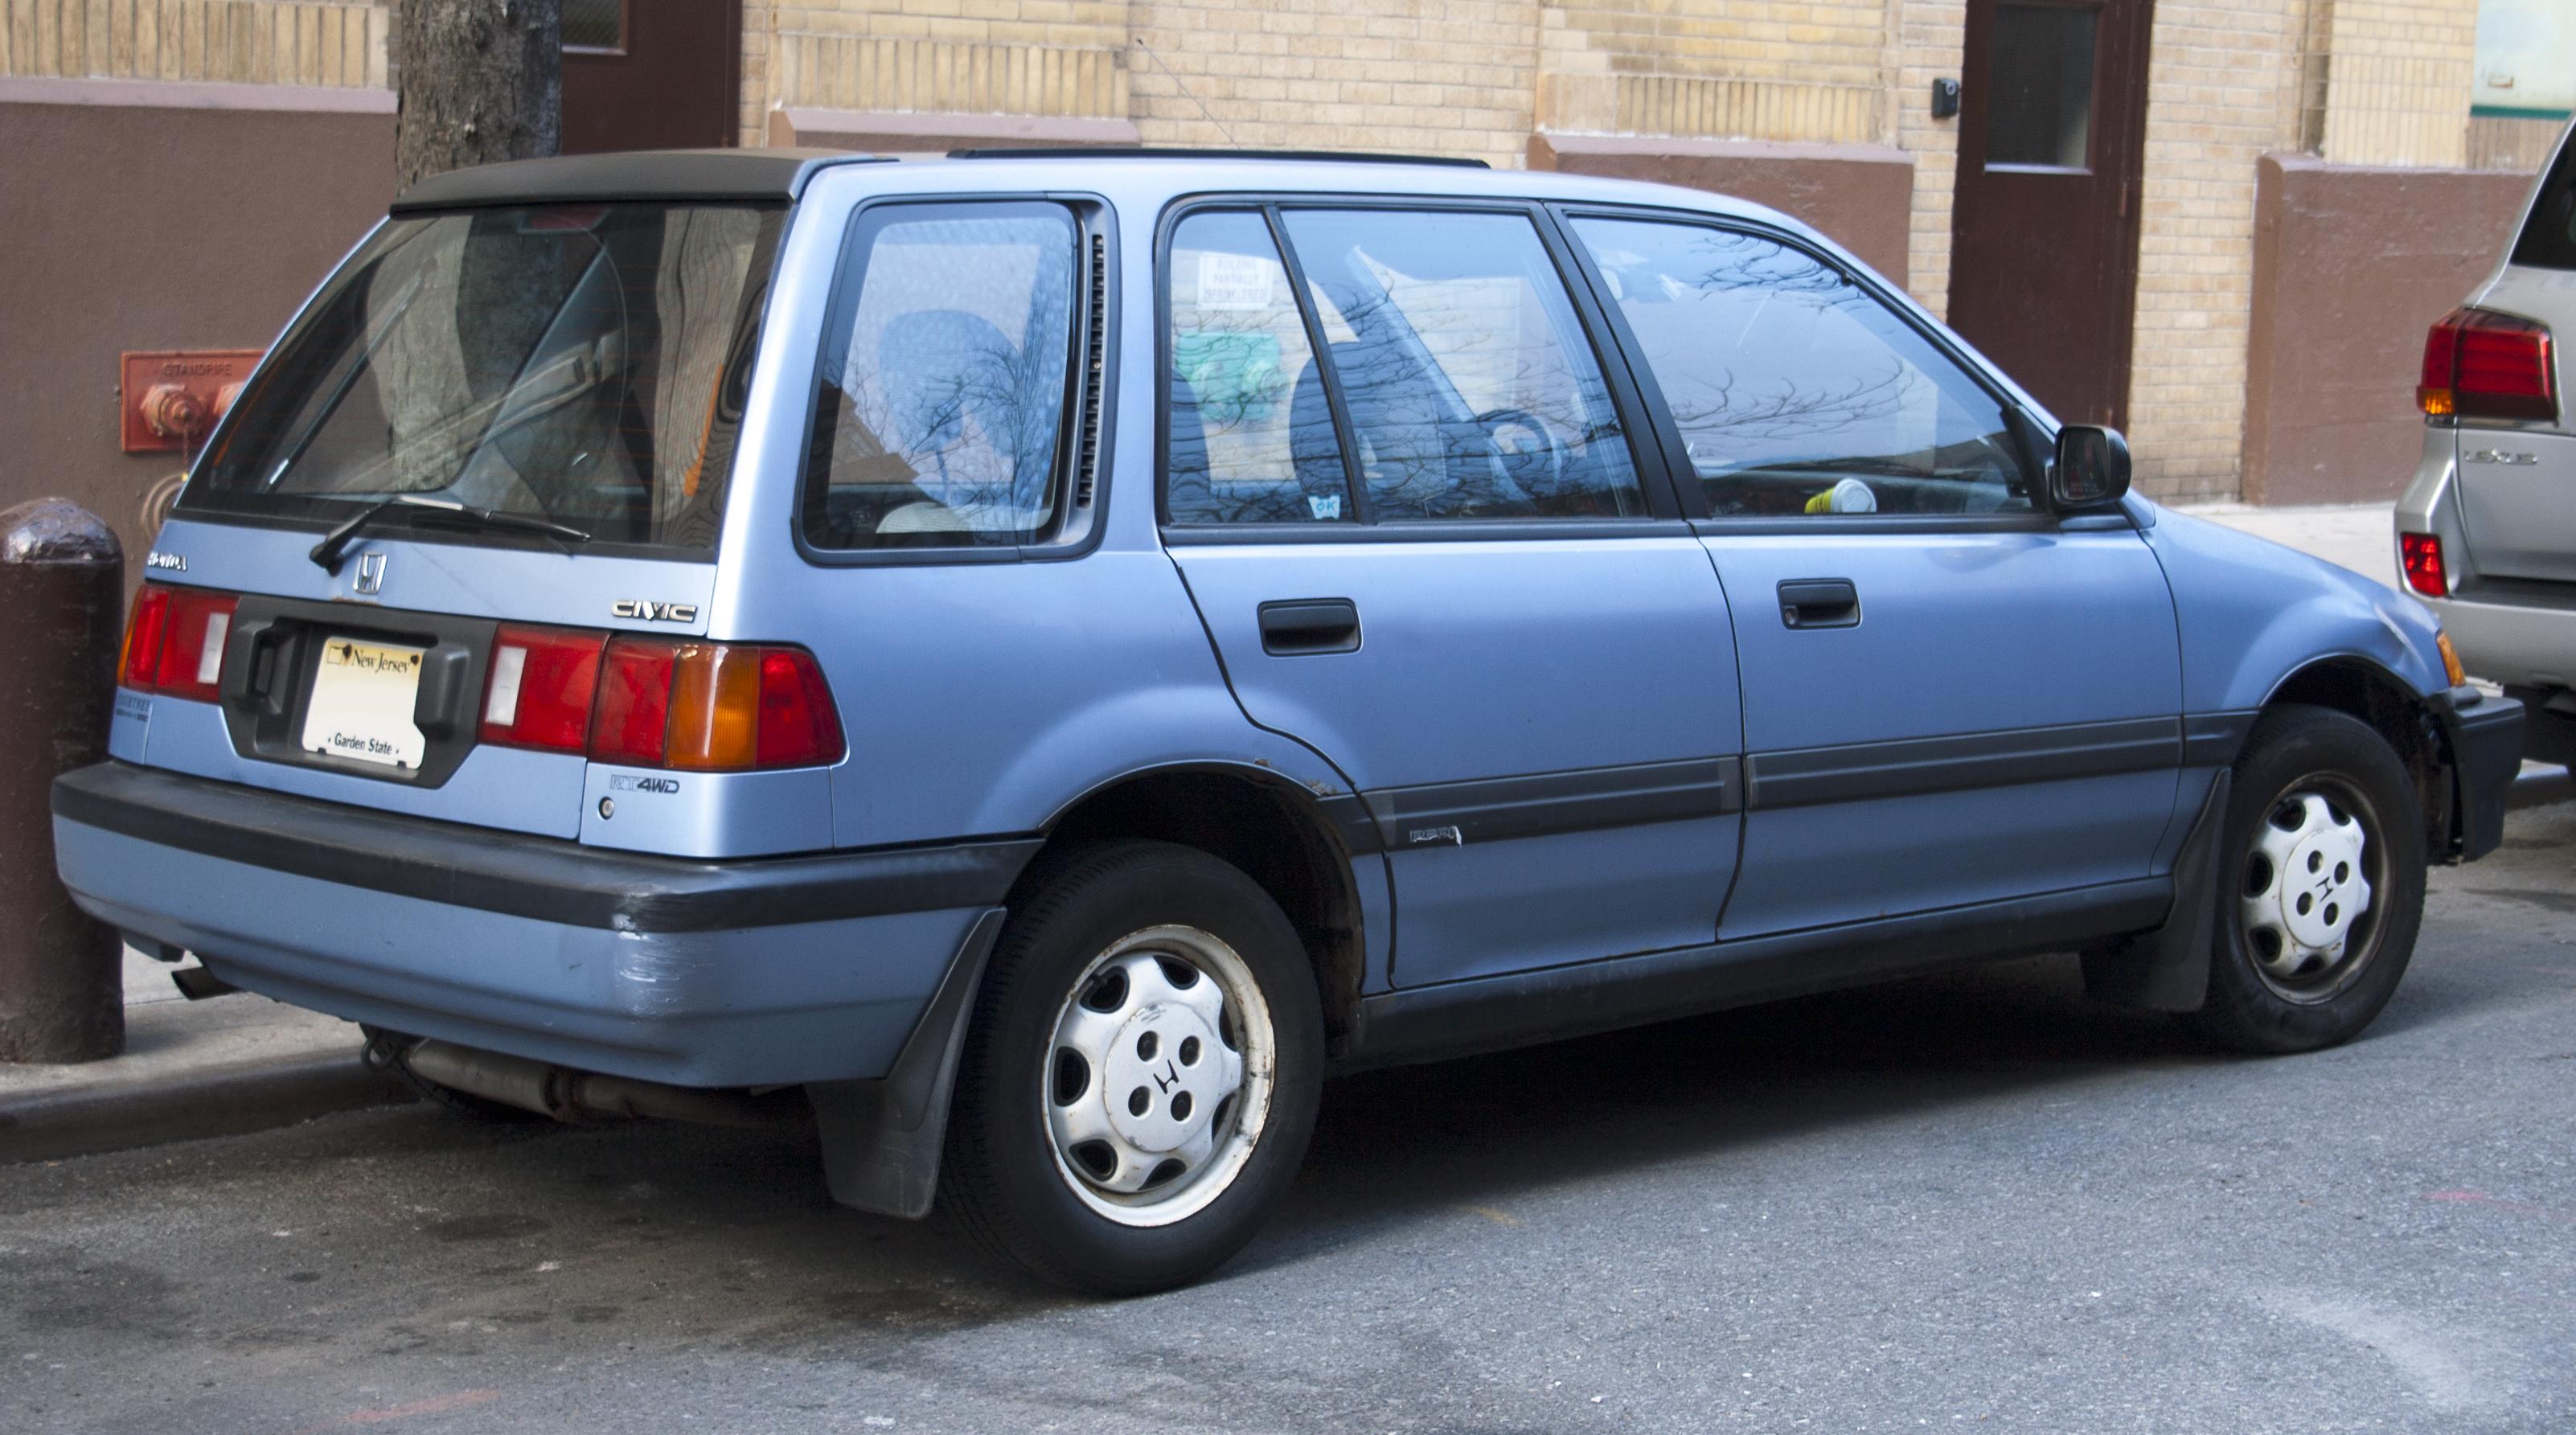 File:Honda Civic Wagon RT4WD.jpg